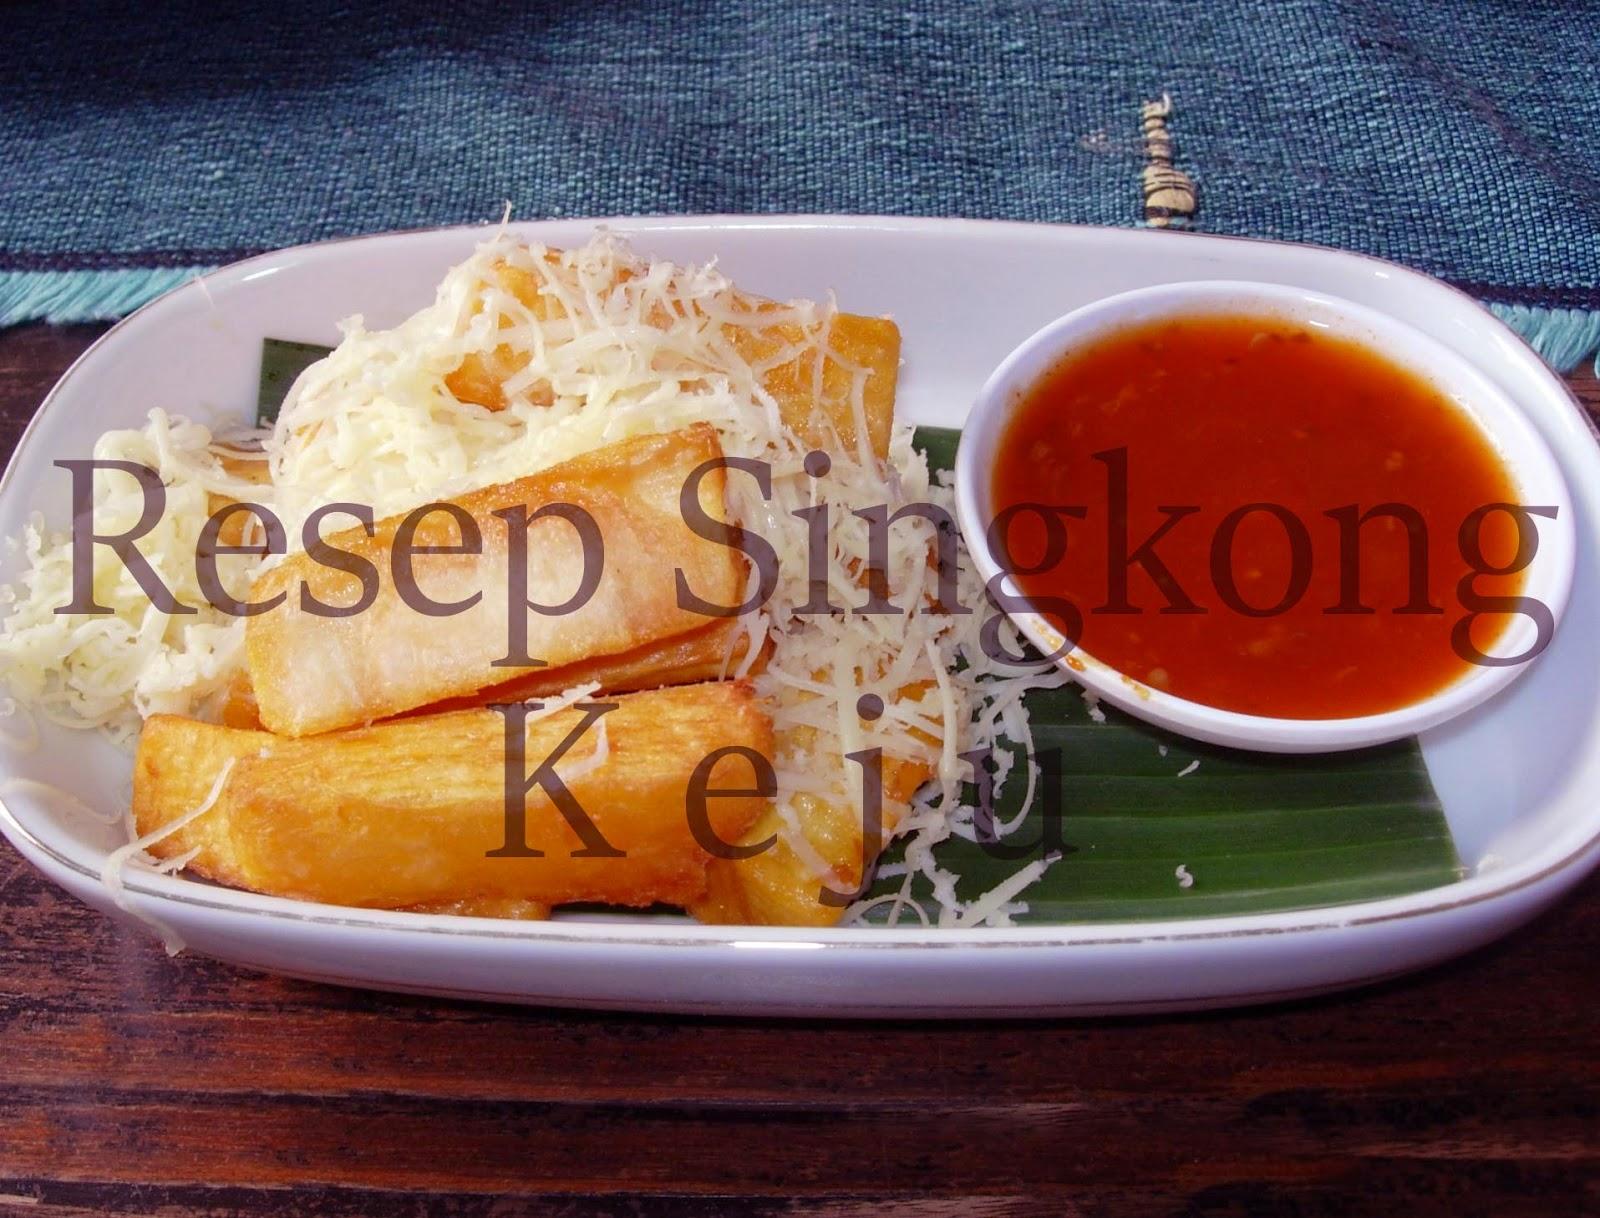 Resep Singkong Keju Goreng, Resep Kue dari Singkong